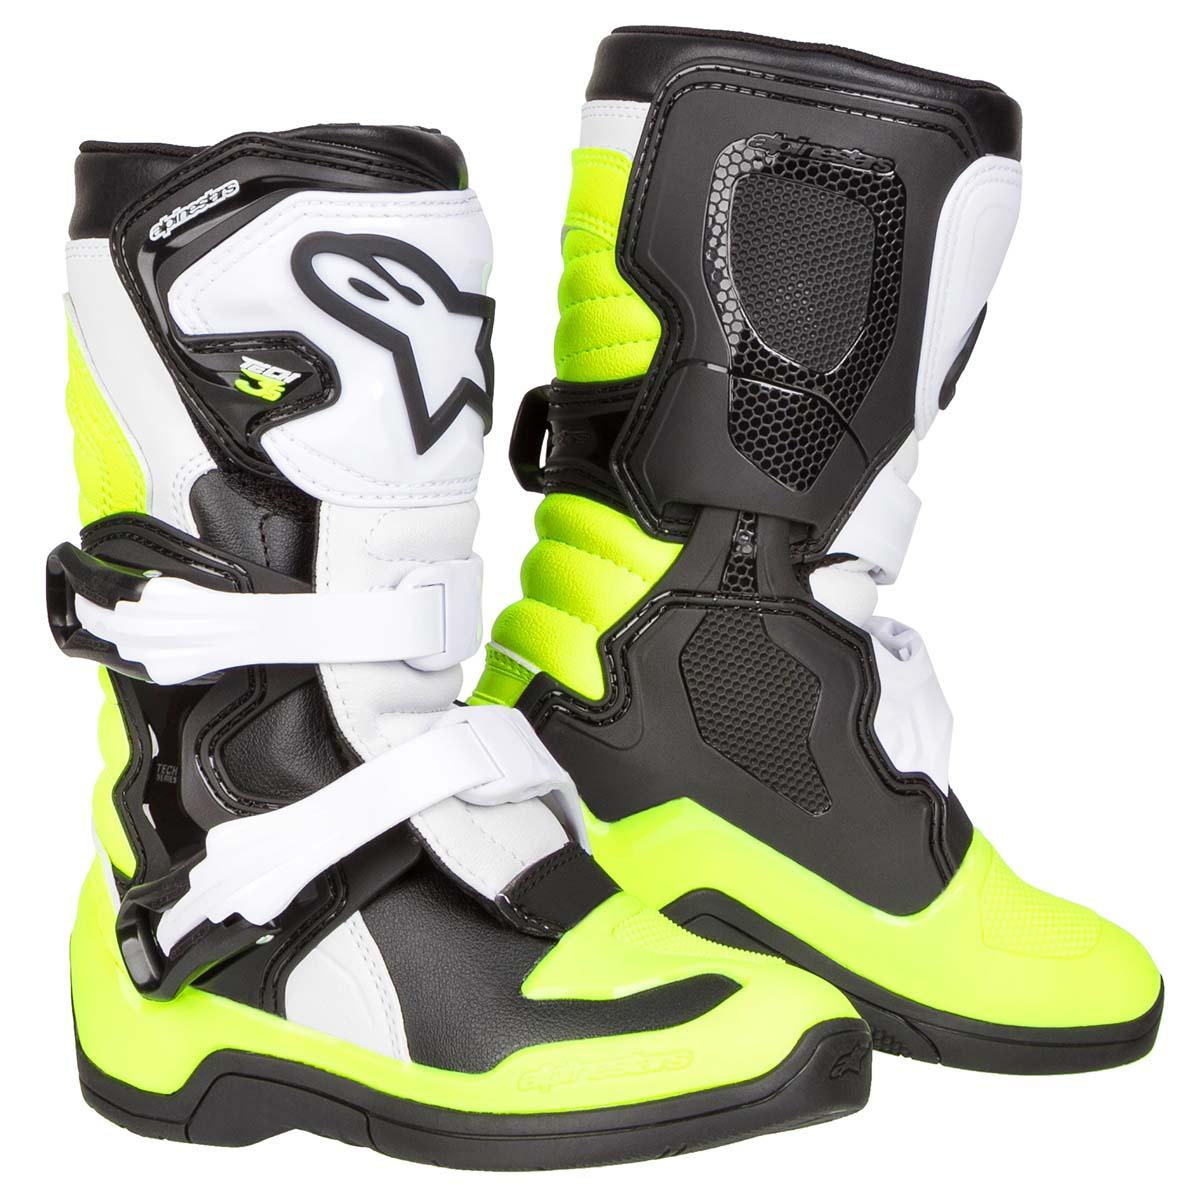 7702c51169227b Alpinestars Kids MX Boots Tech 3S Black White Yellow Fluo 2019 ...